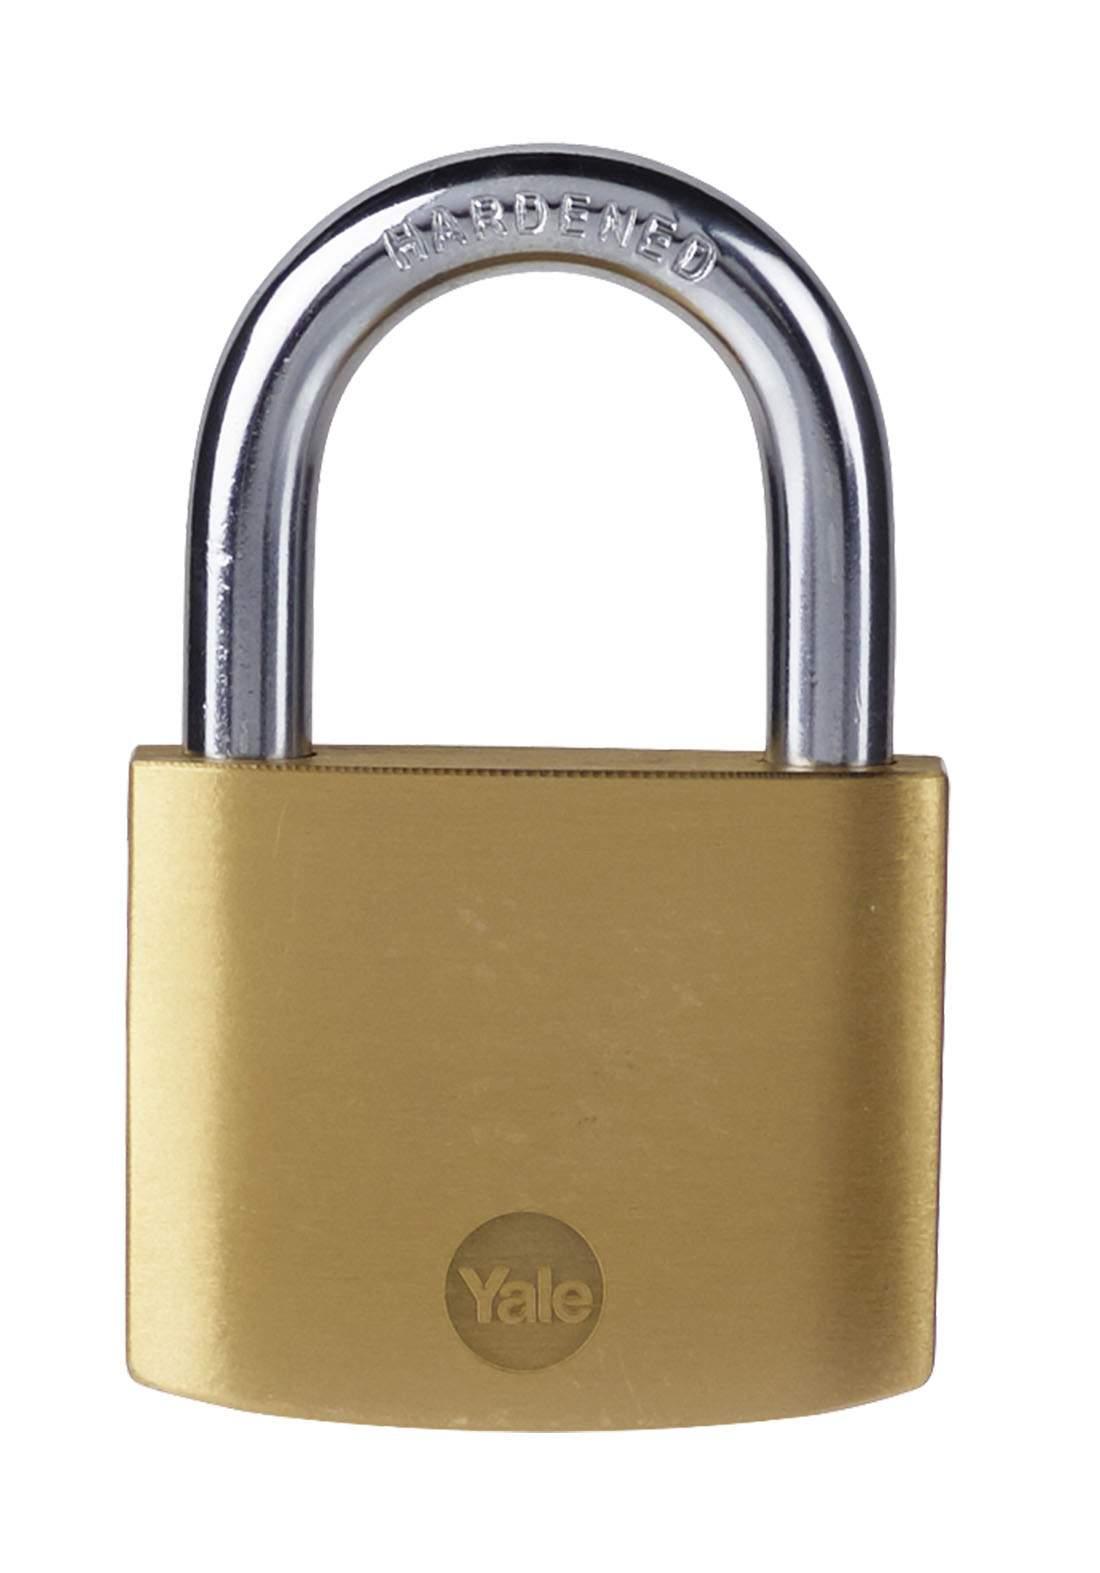 Yale Y110B/50/126/1 Padlock Brass 50 mm قفل للاغراض العامة